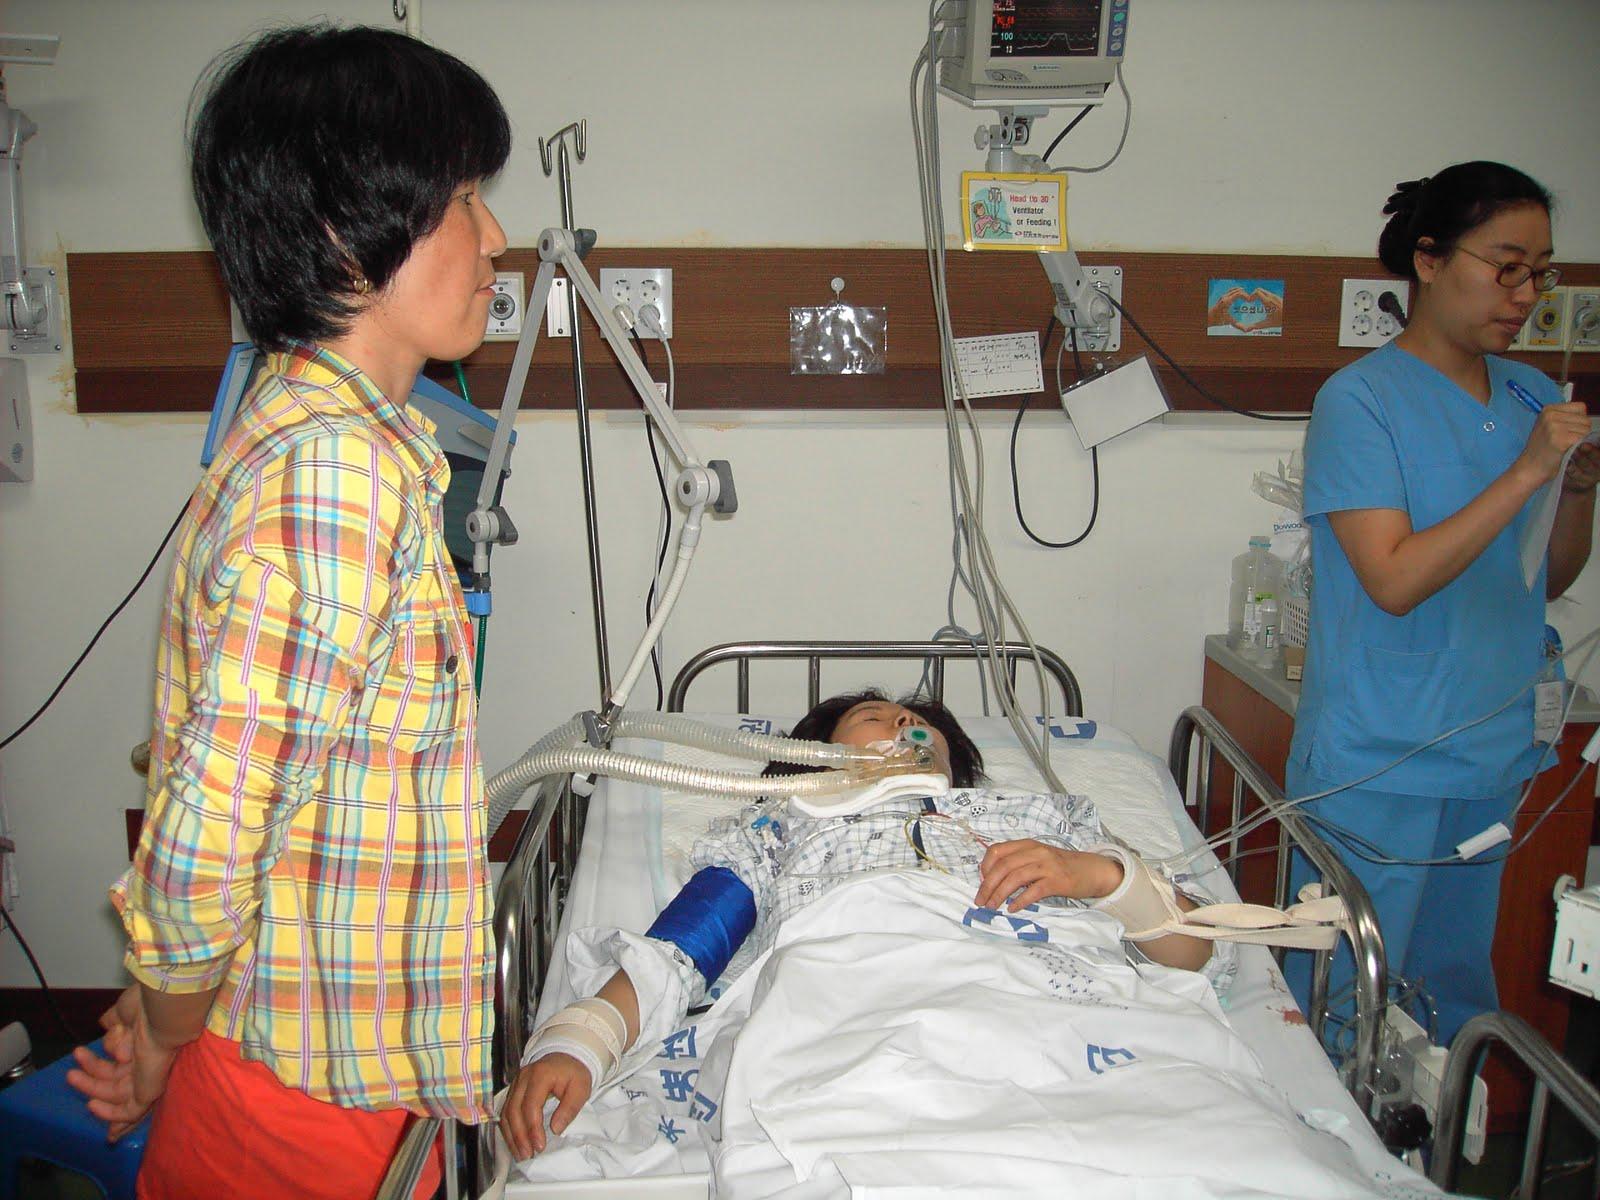 Ventilator Patient Child Requiring a ventilator toVentilator Patient Child